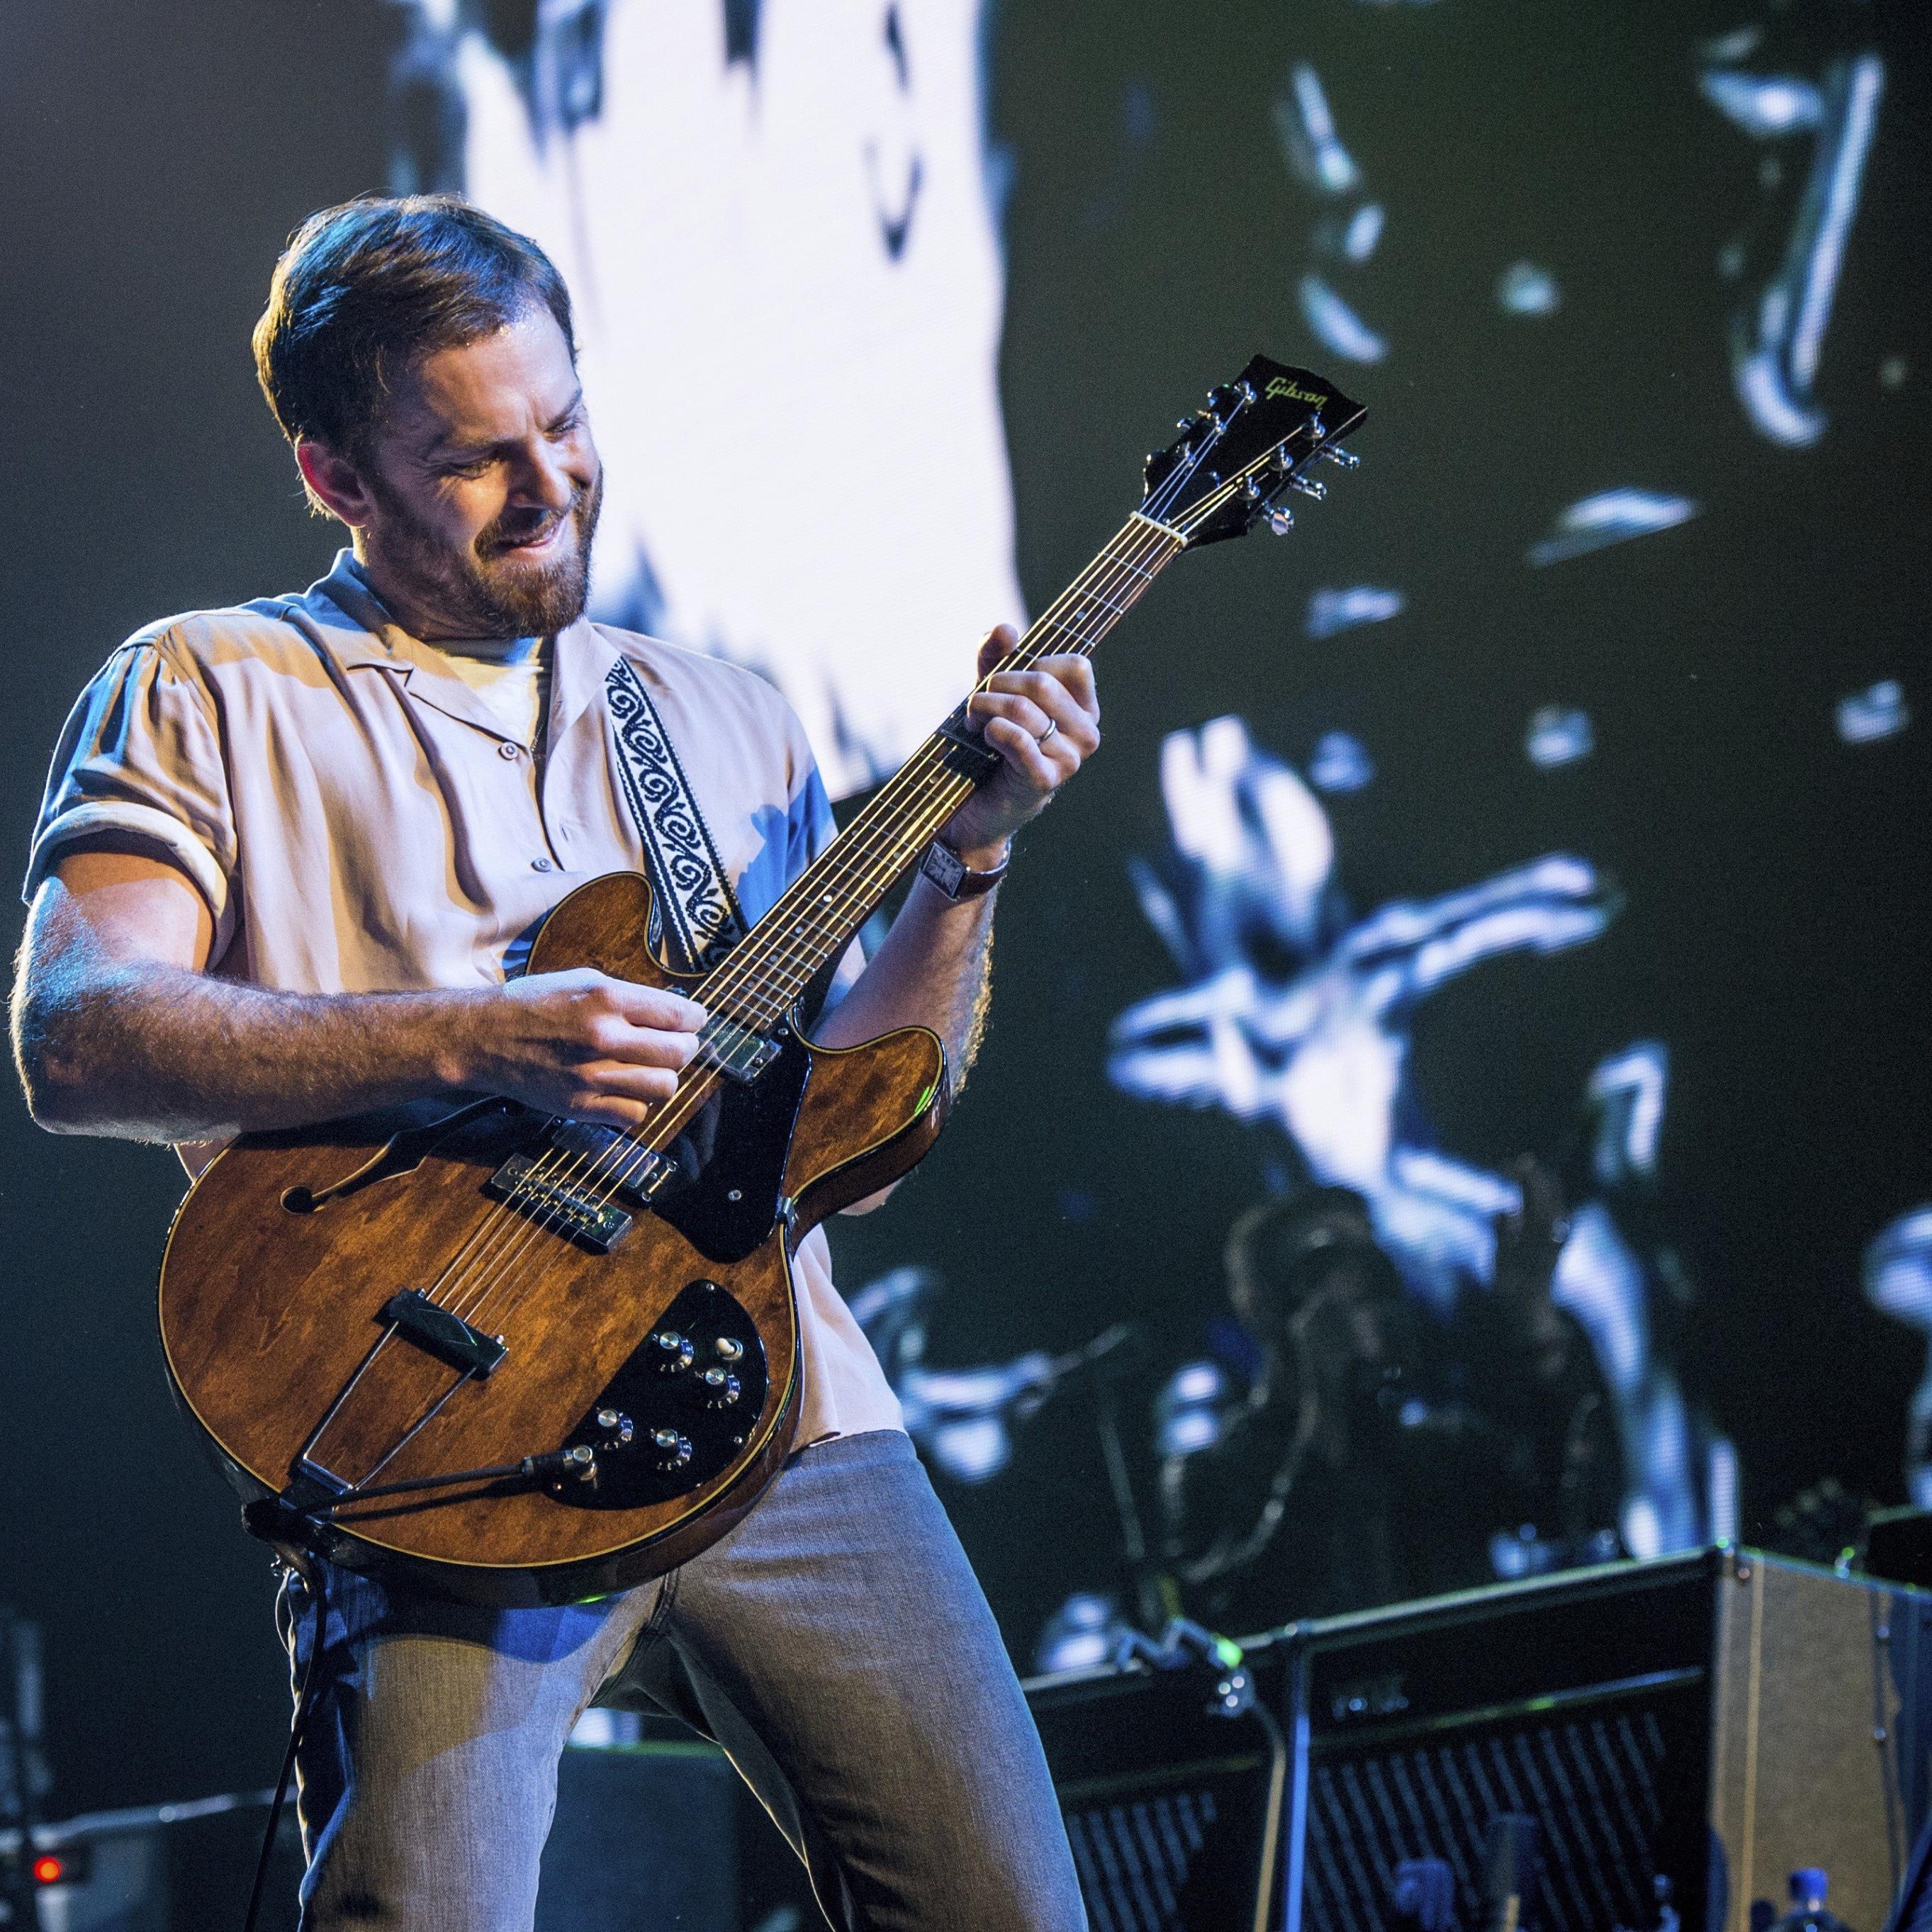 Kings Of Leon als Headliner am Rock in Vienna 2017 bestätigt.